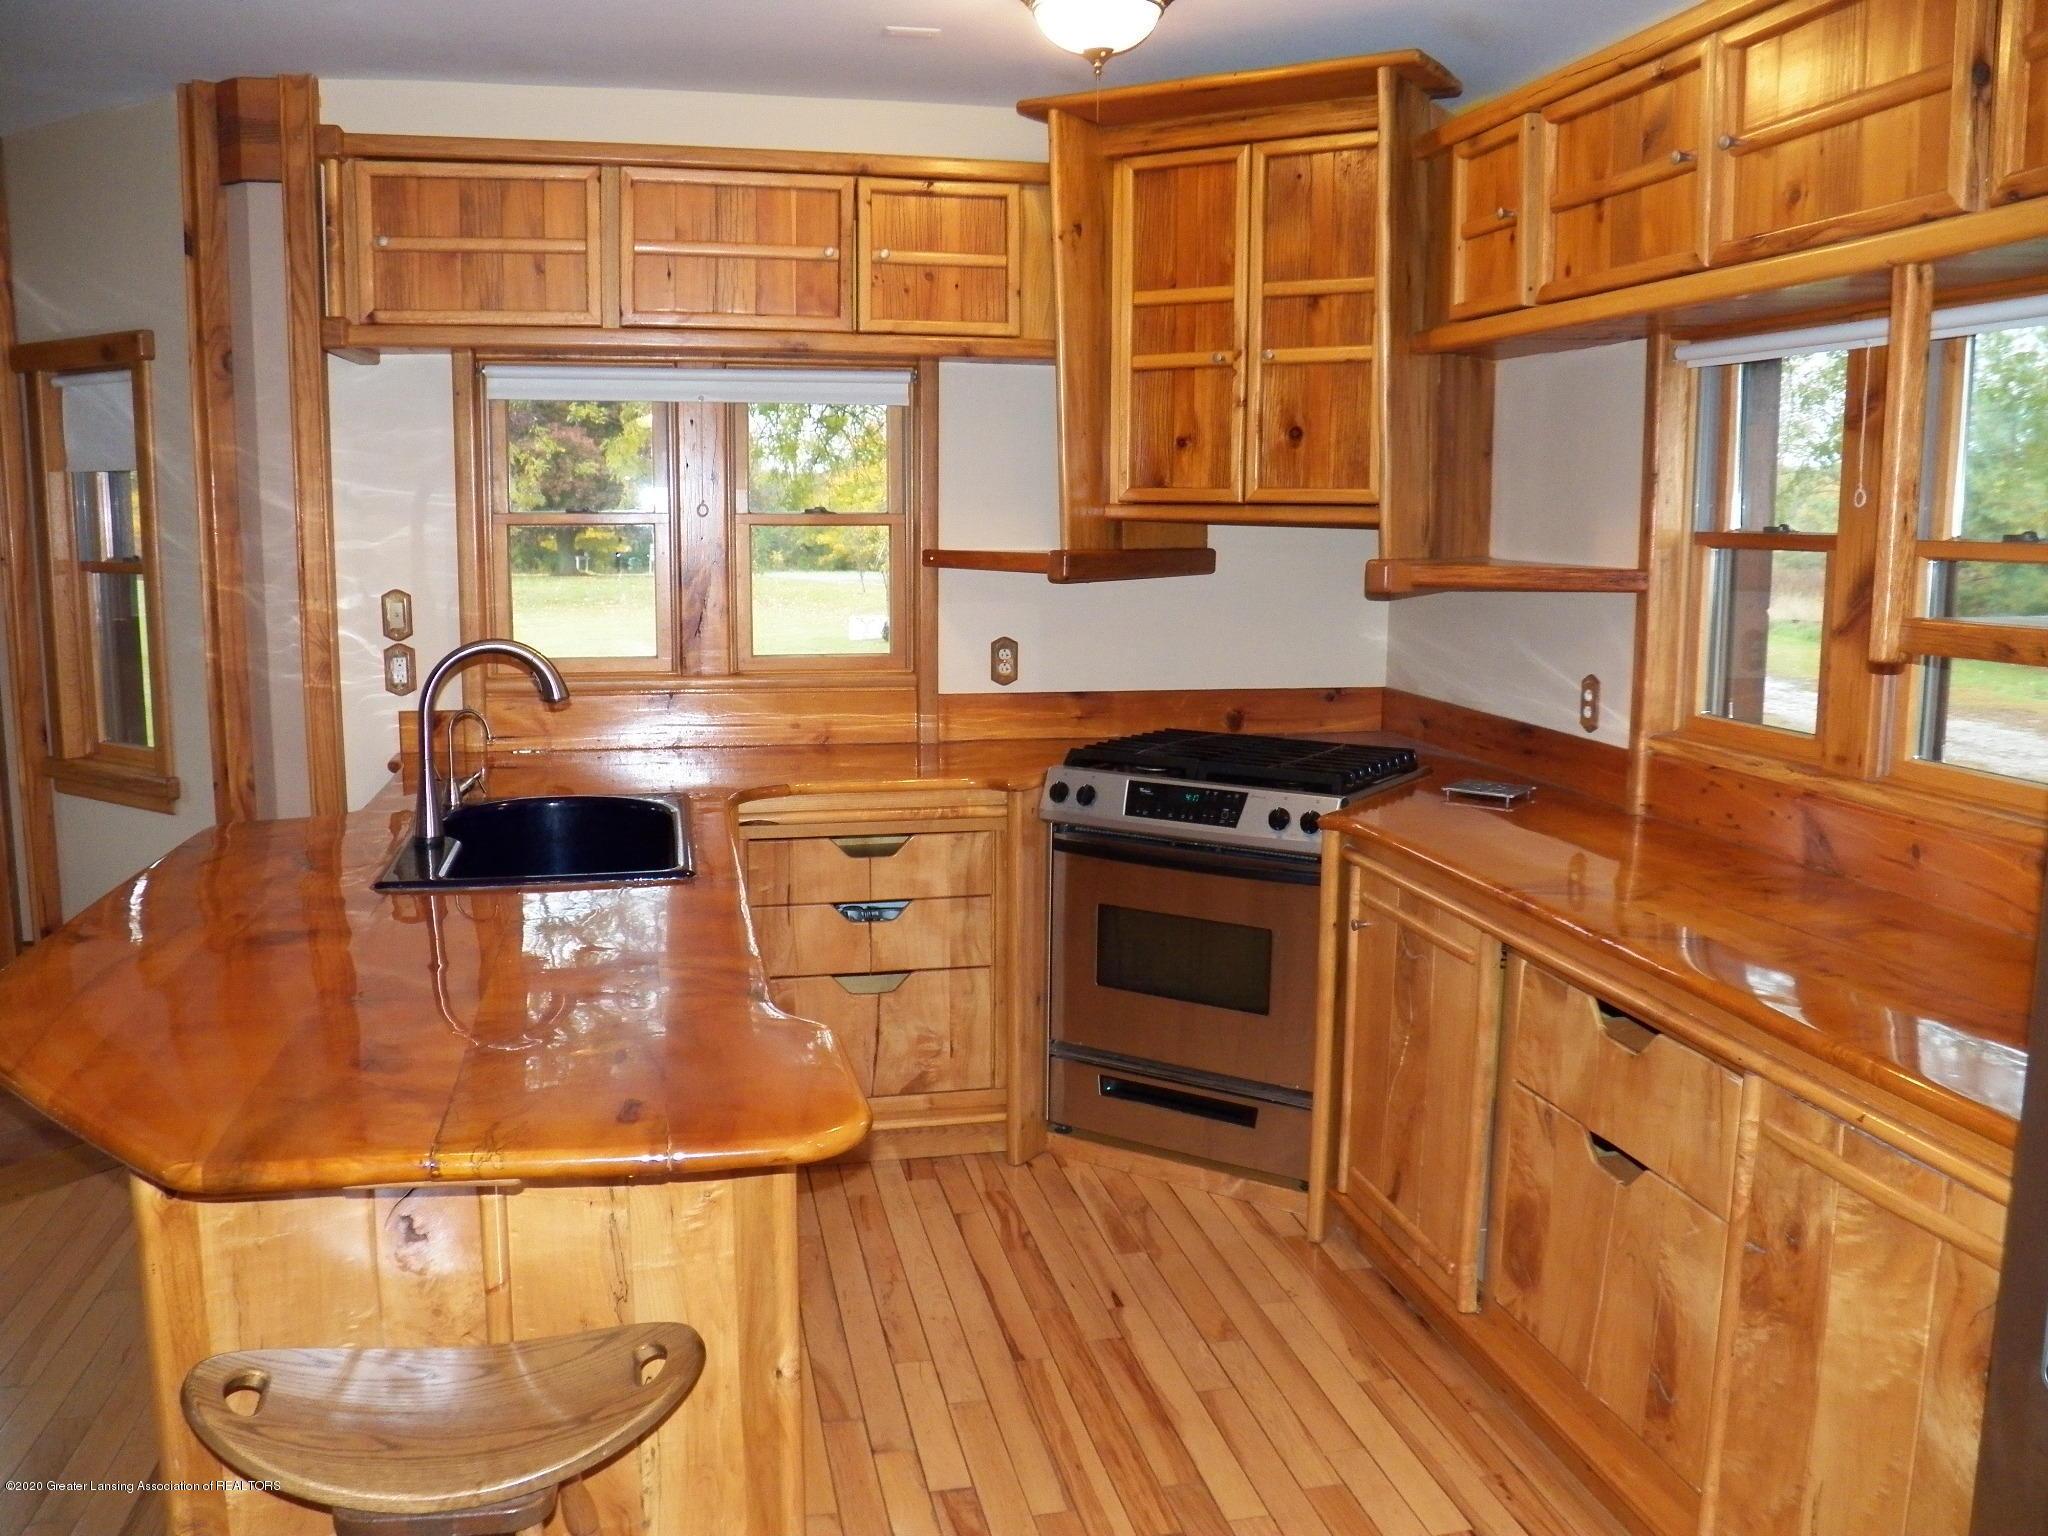 1584 W Barnes Rd - kitchen - 6